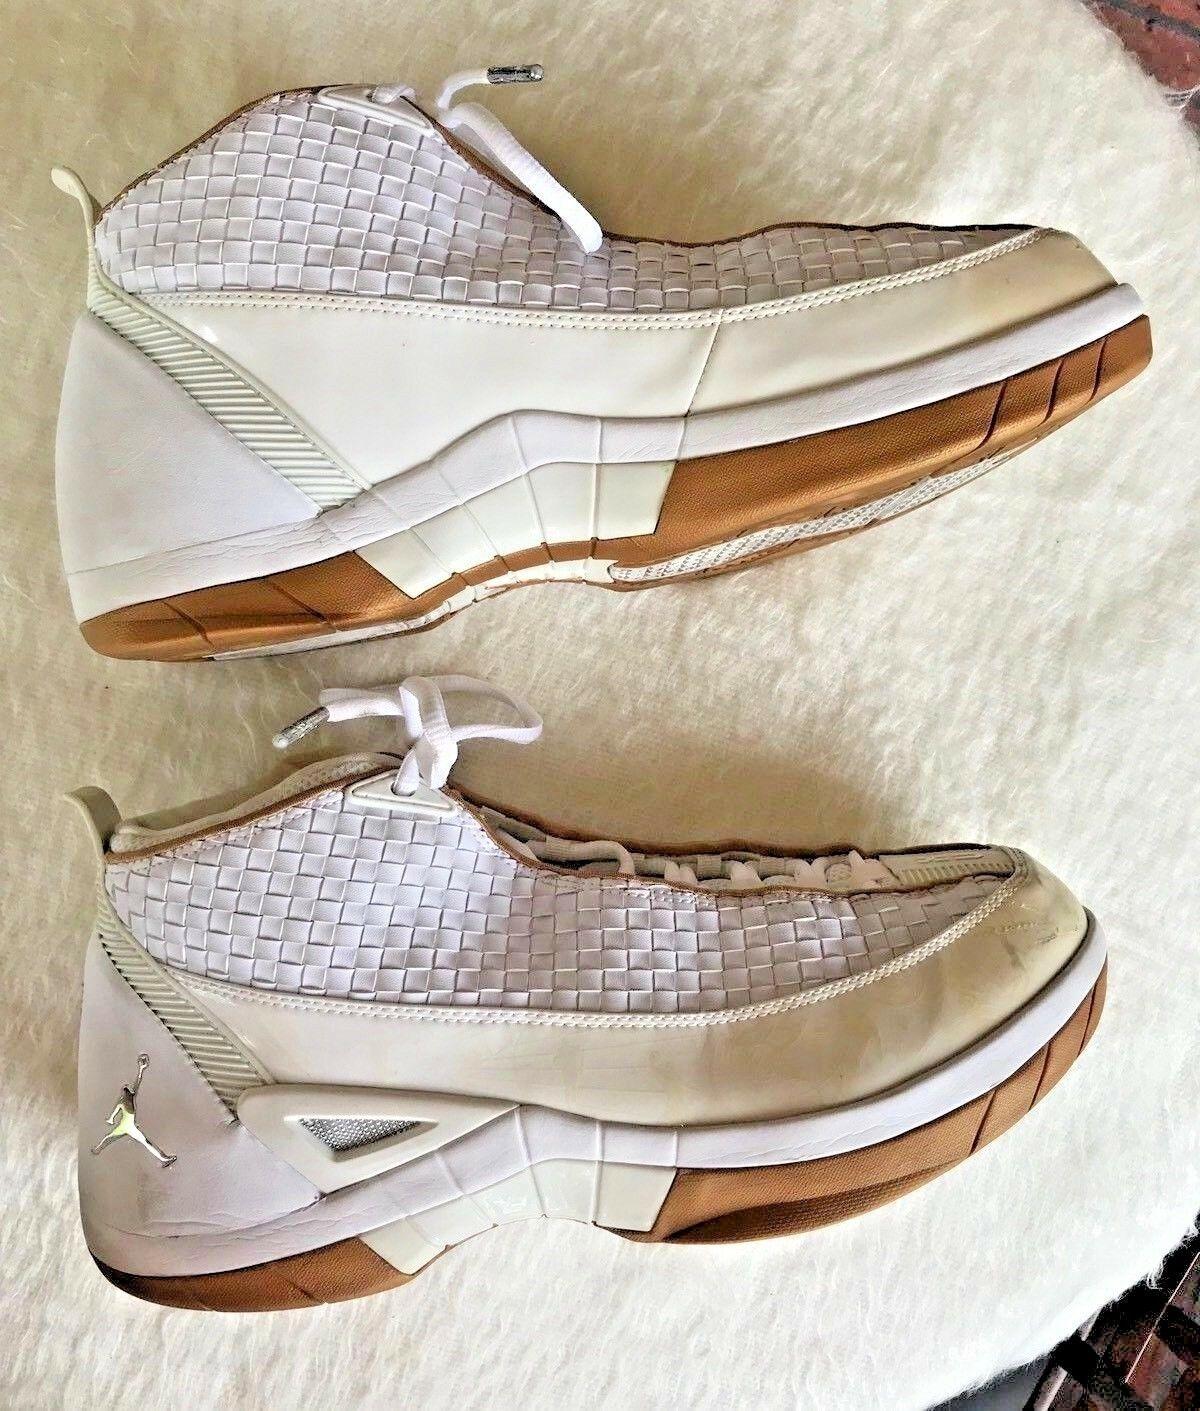 93ec789cc6aff8 Nike Air Jordan XV SE Size 11.5 High Top Tennis Shoes White Gold Silver  Leather